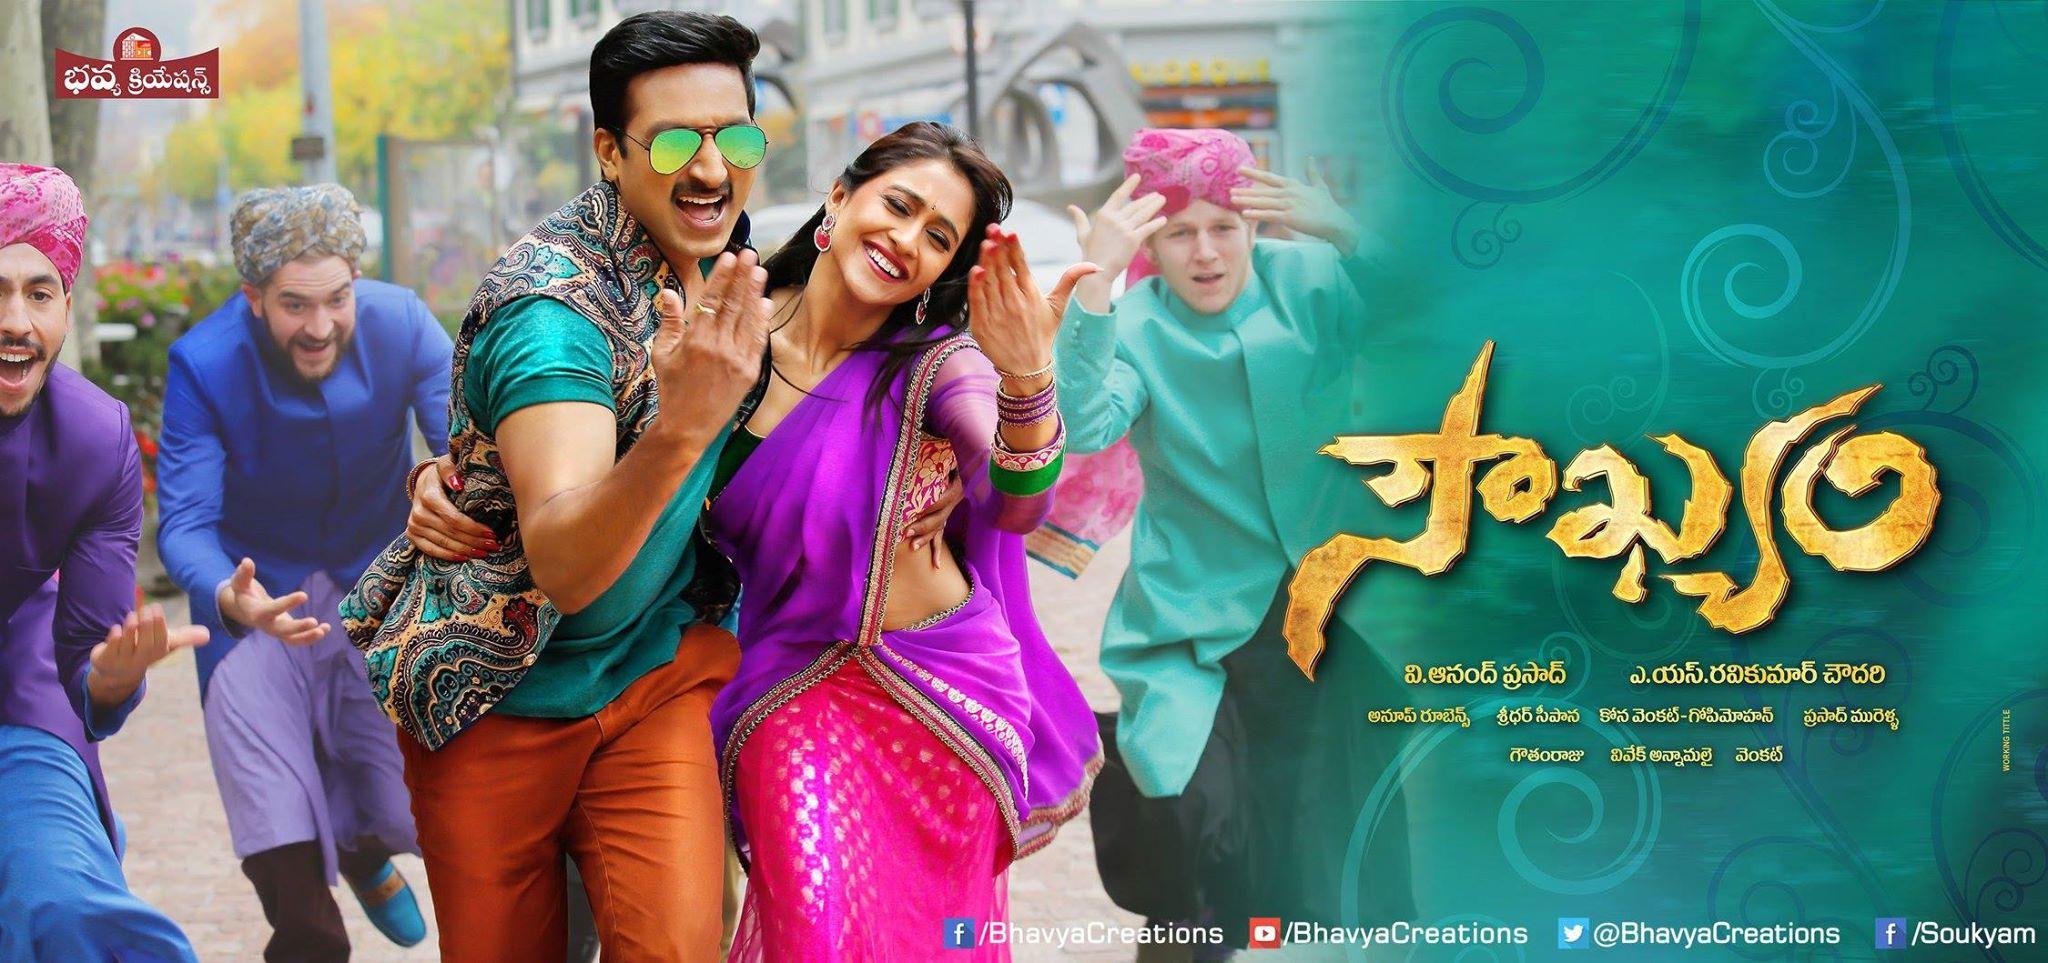 Nara Rohit Balakrishnudu Movie First Look Ultra Hd Posters: Soukyam Telugu Movie ULTRA HD Posters, Wallpapers